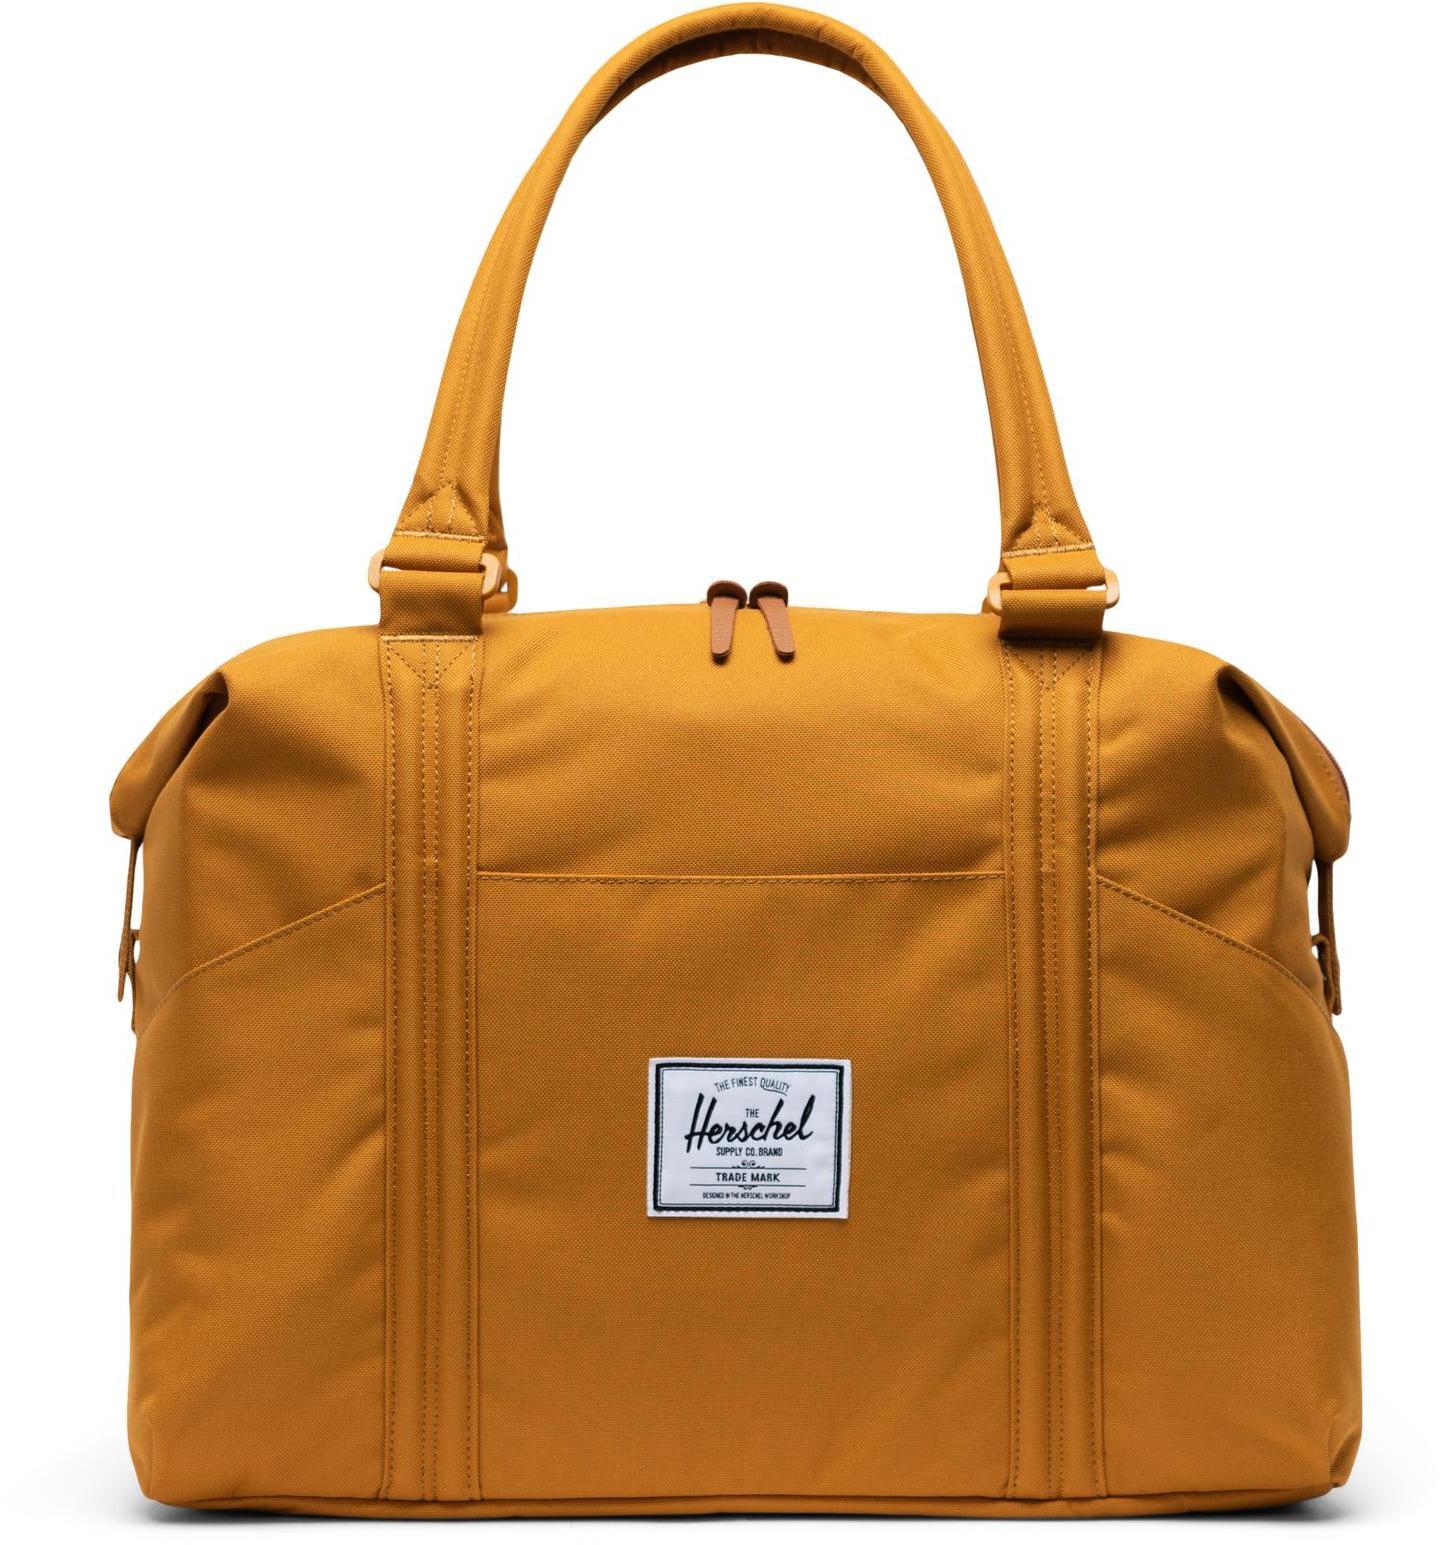 Herschel Strand Tote, buckthorn brown (2019) | Travel bags